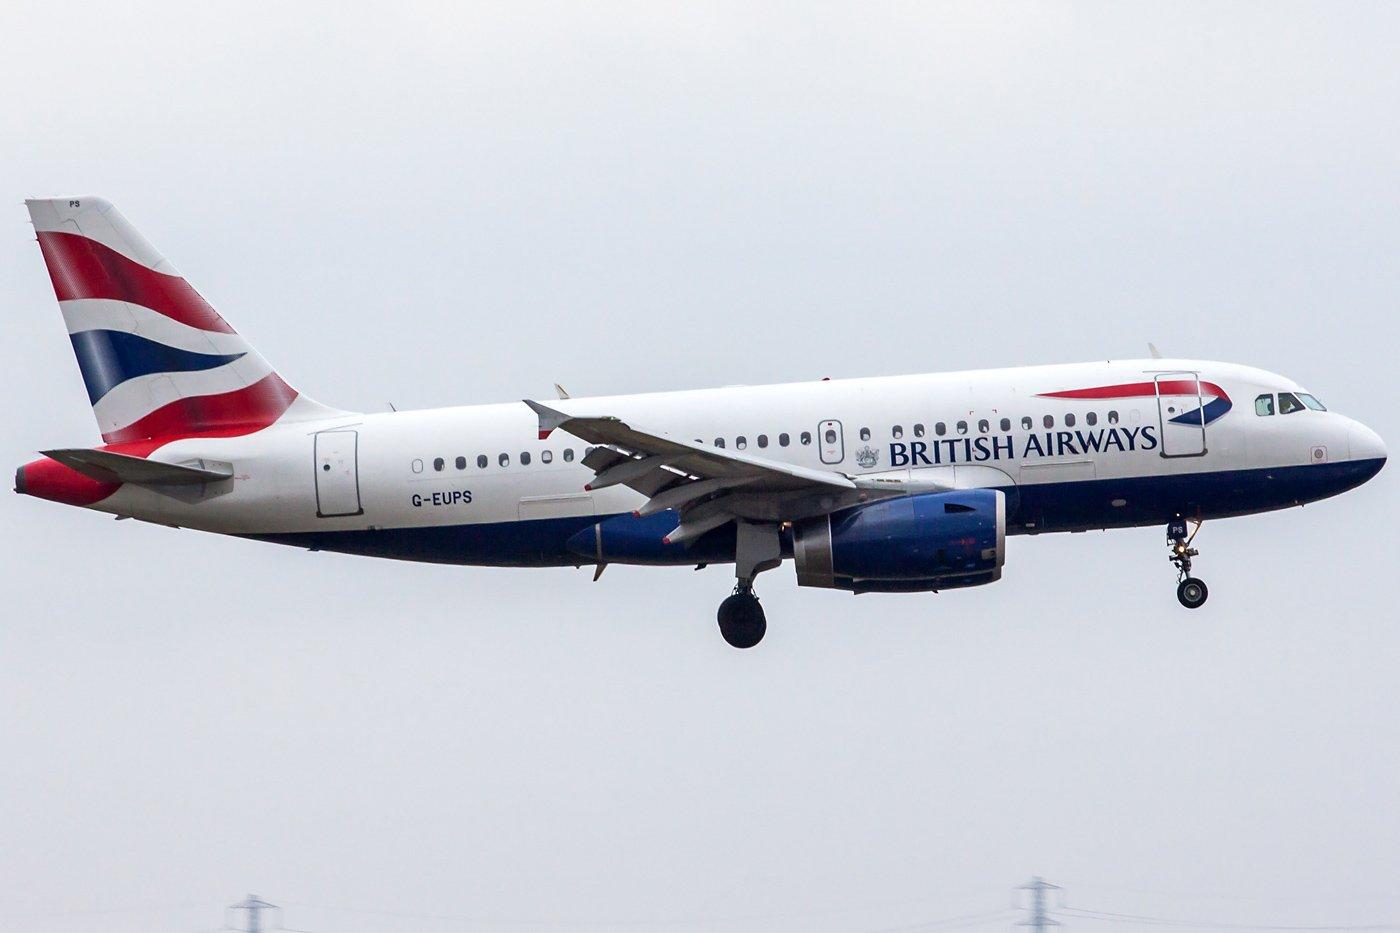 British Airways Airbus A319-131 G-EUPS